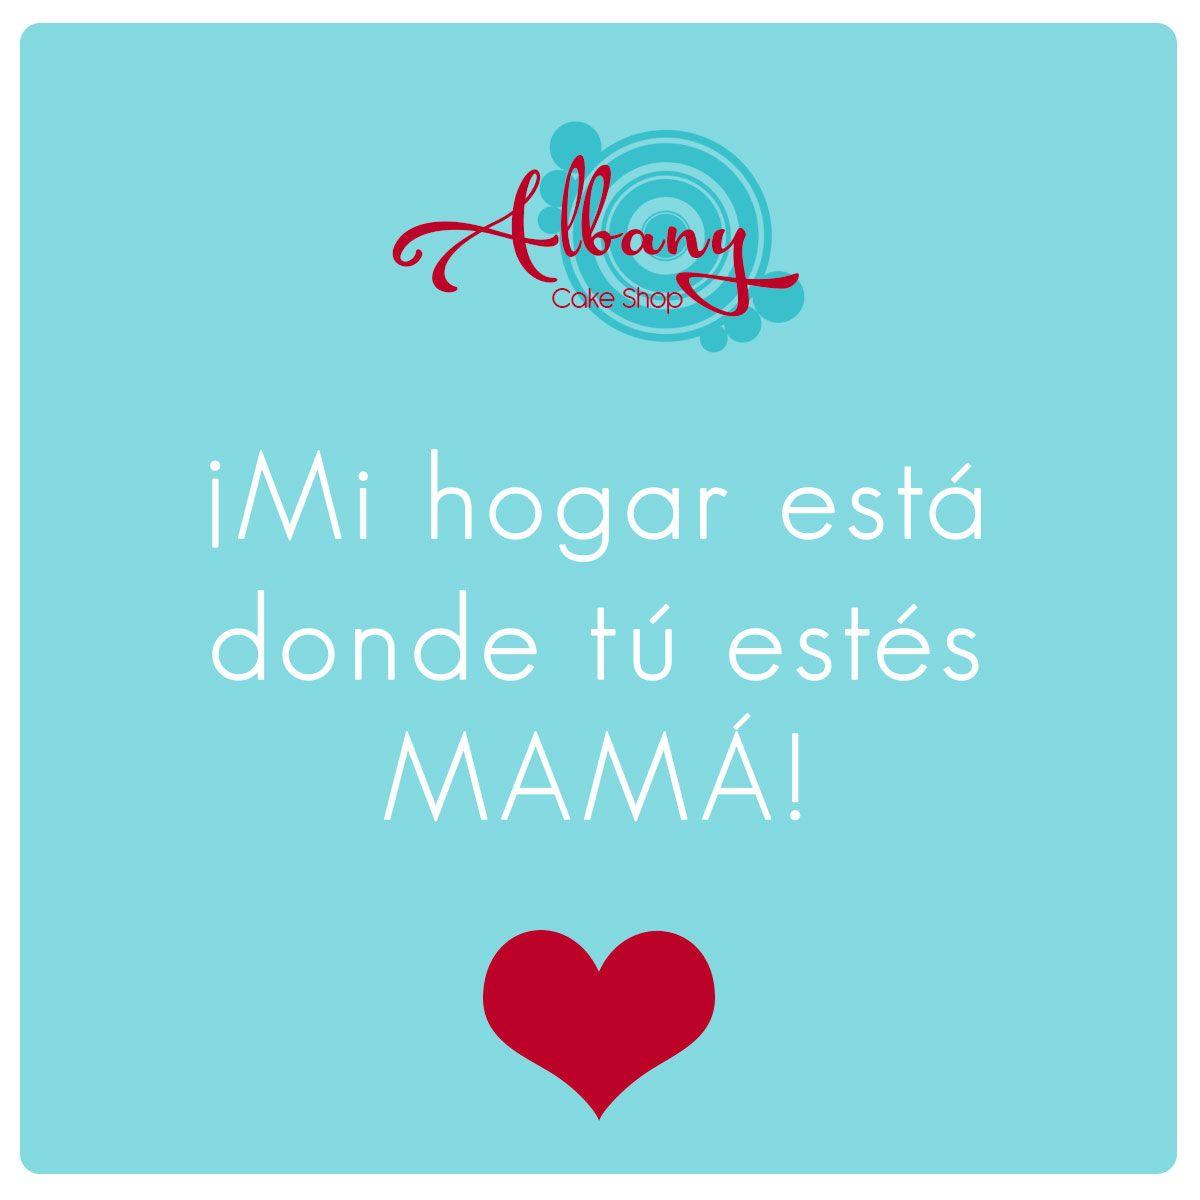 Gracias Madre Quotes Sorprende A Mamá Con Un Dulce Detalle Para Agradecerle Por Todo Su